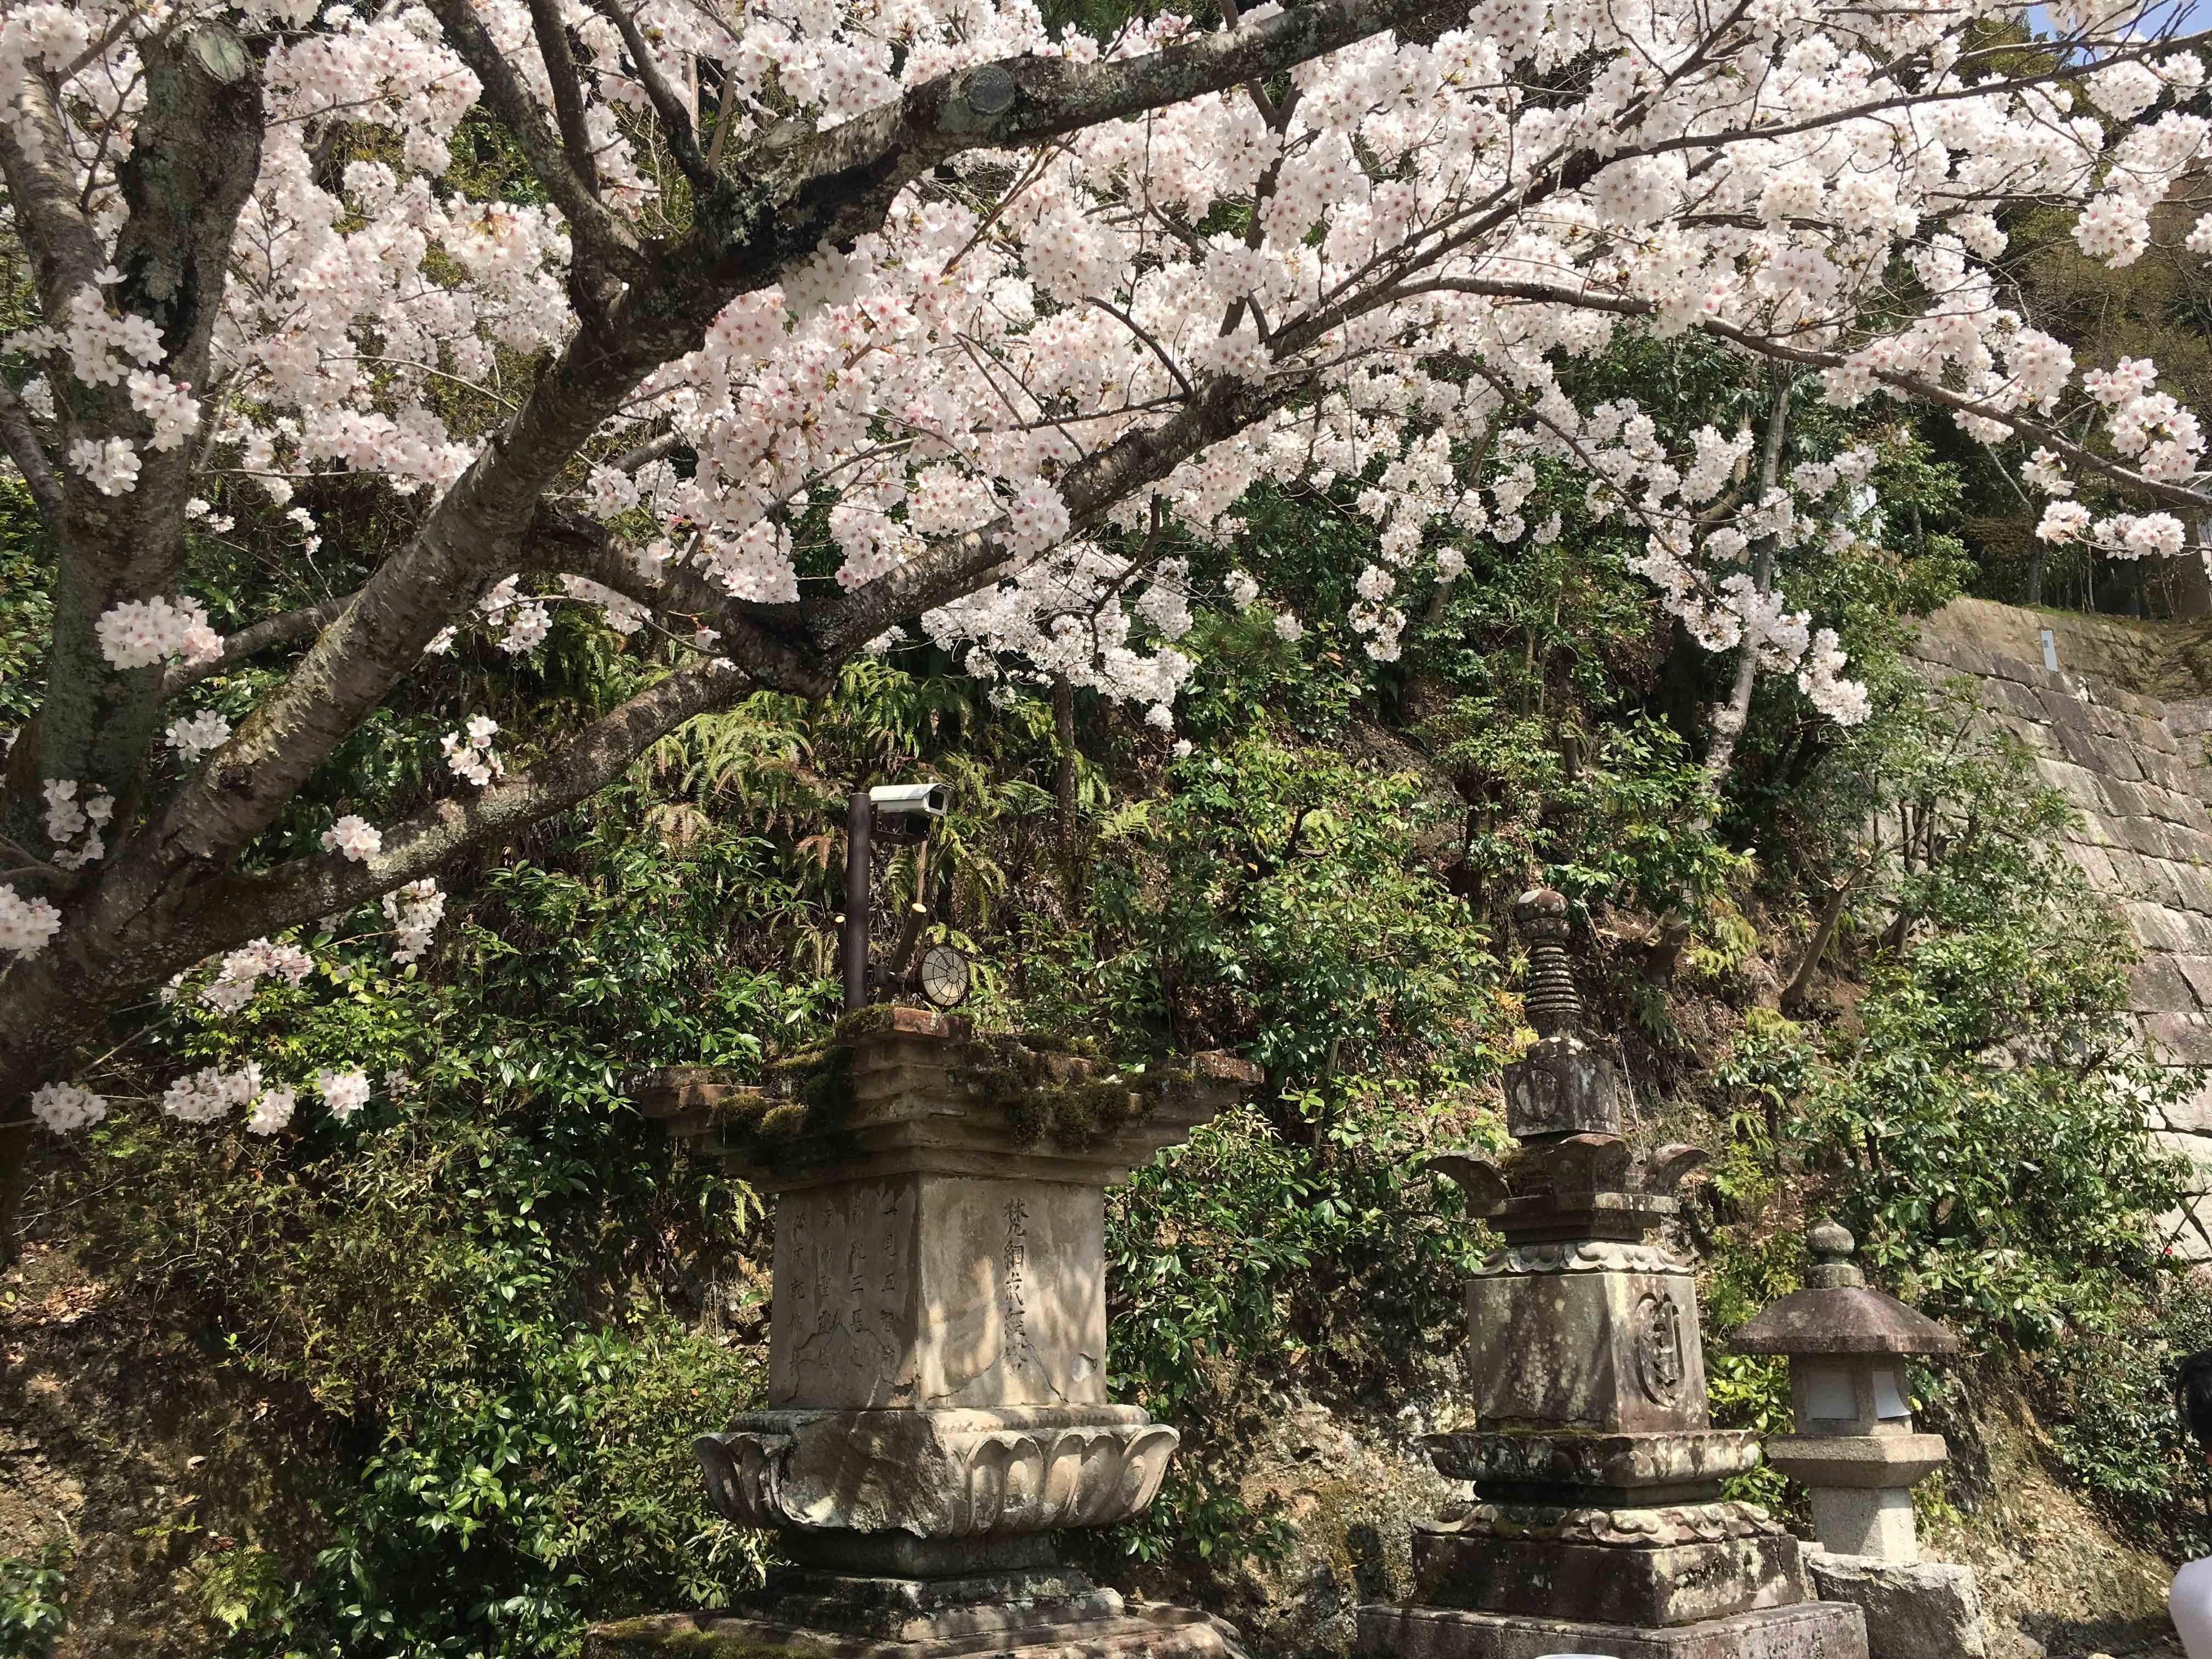 japonya-gezi-rehberi-sakuralar